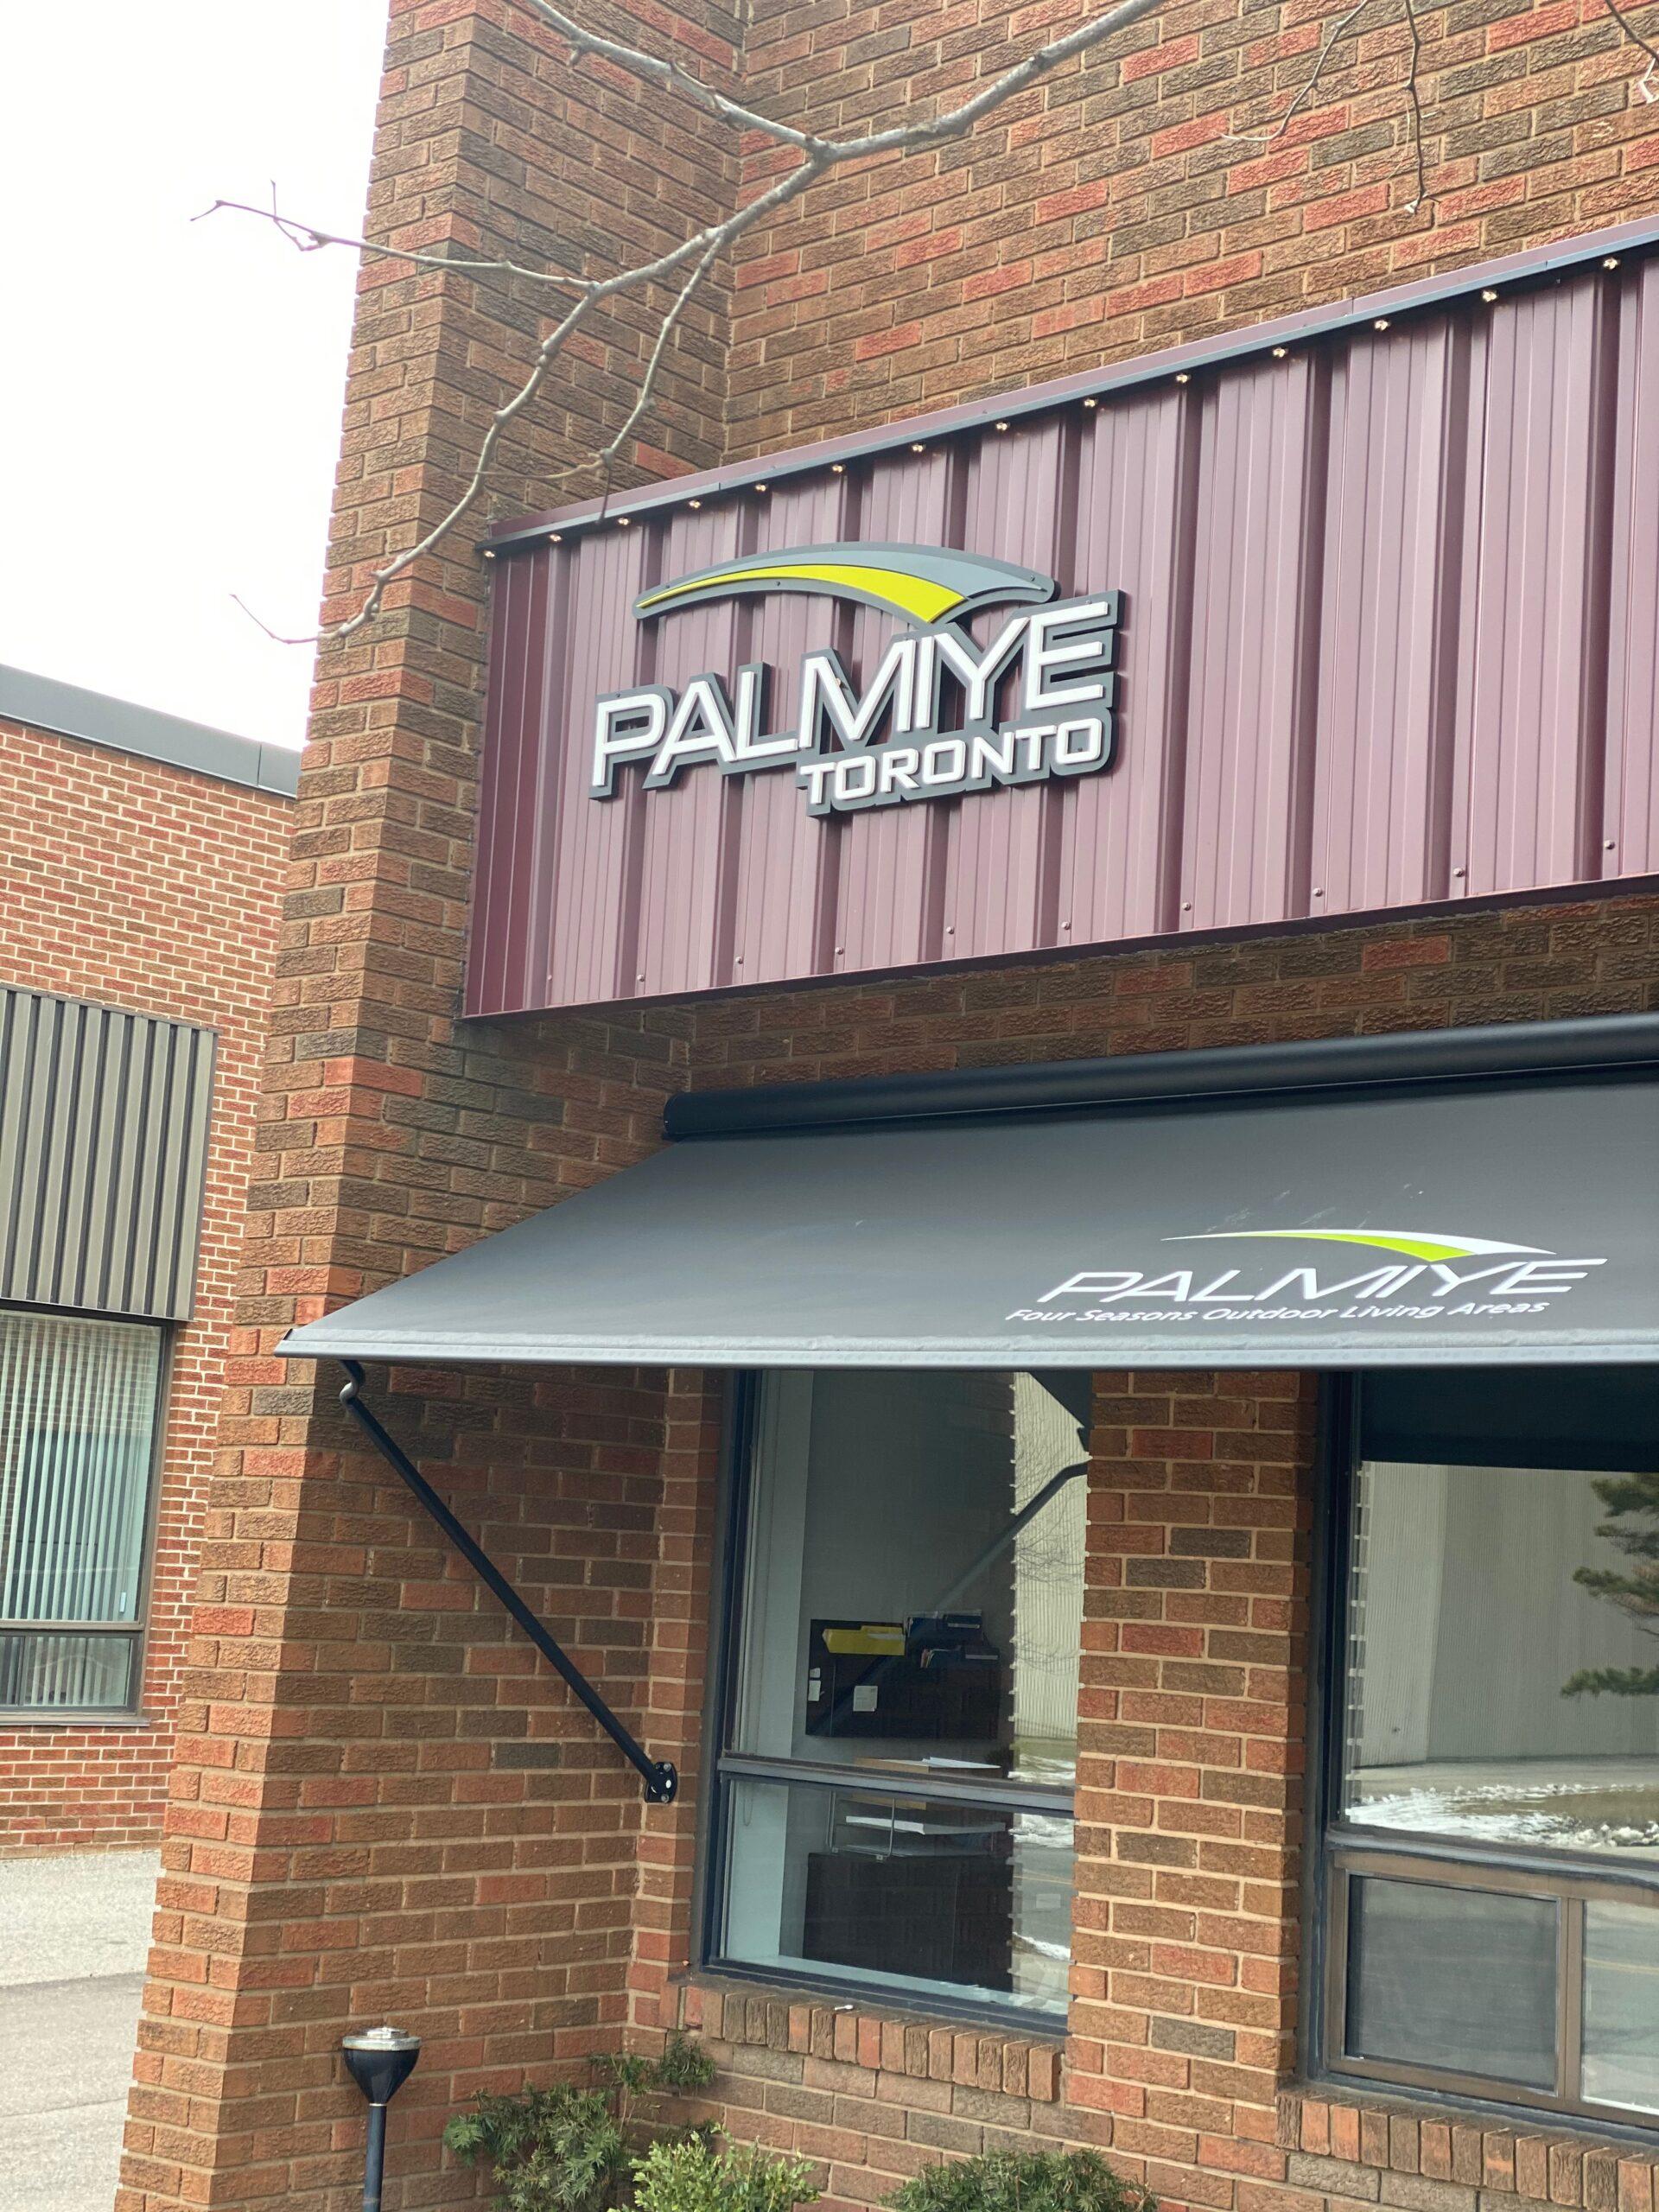 Palmiye Toronto office